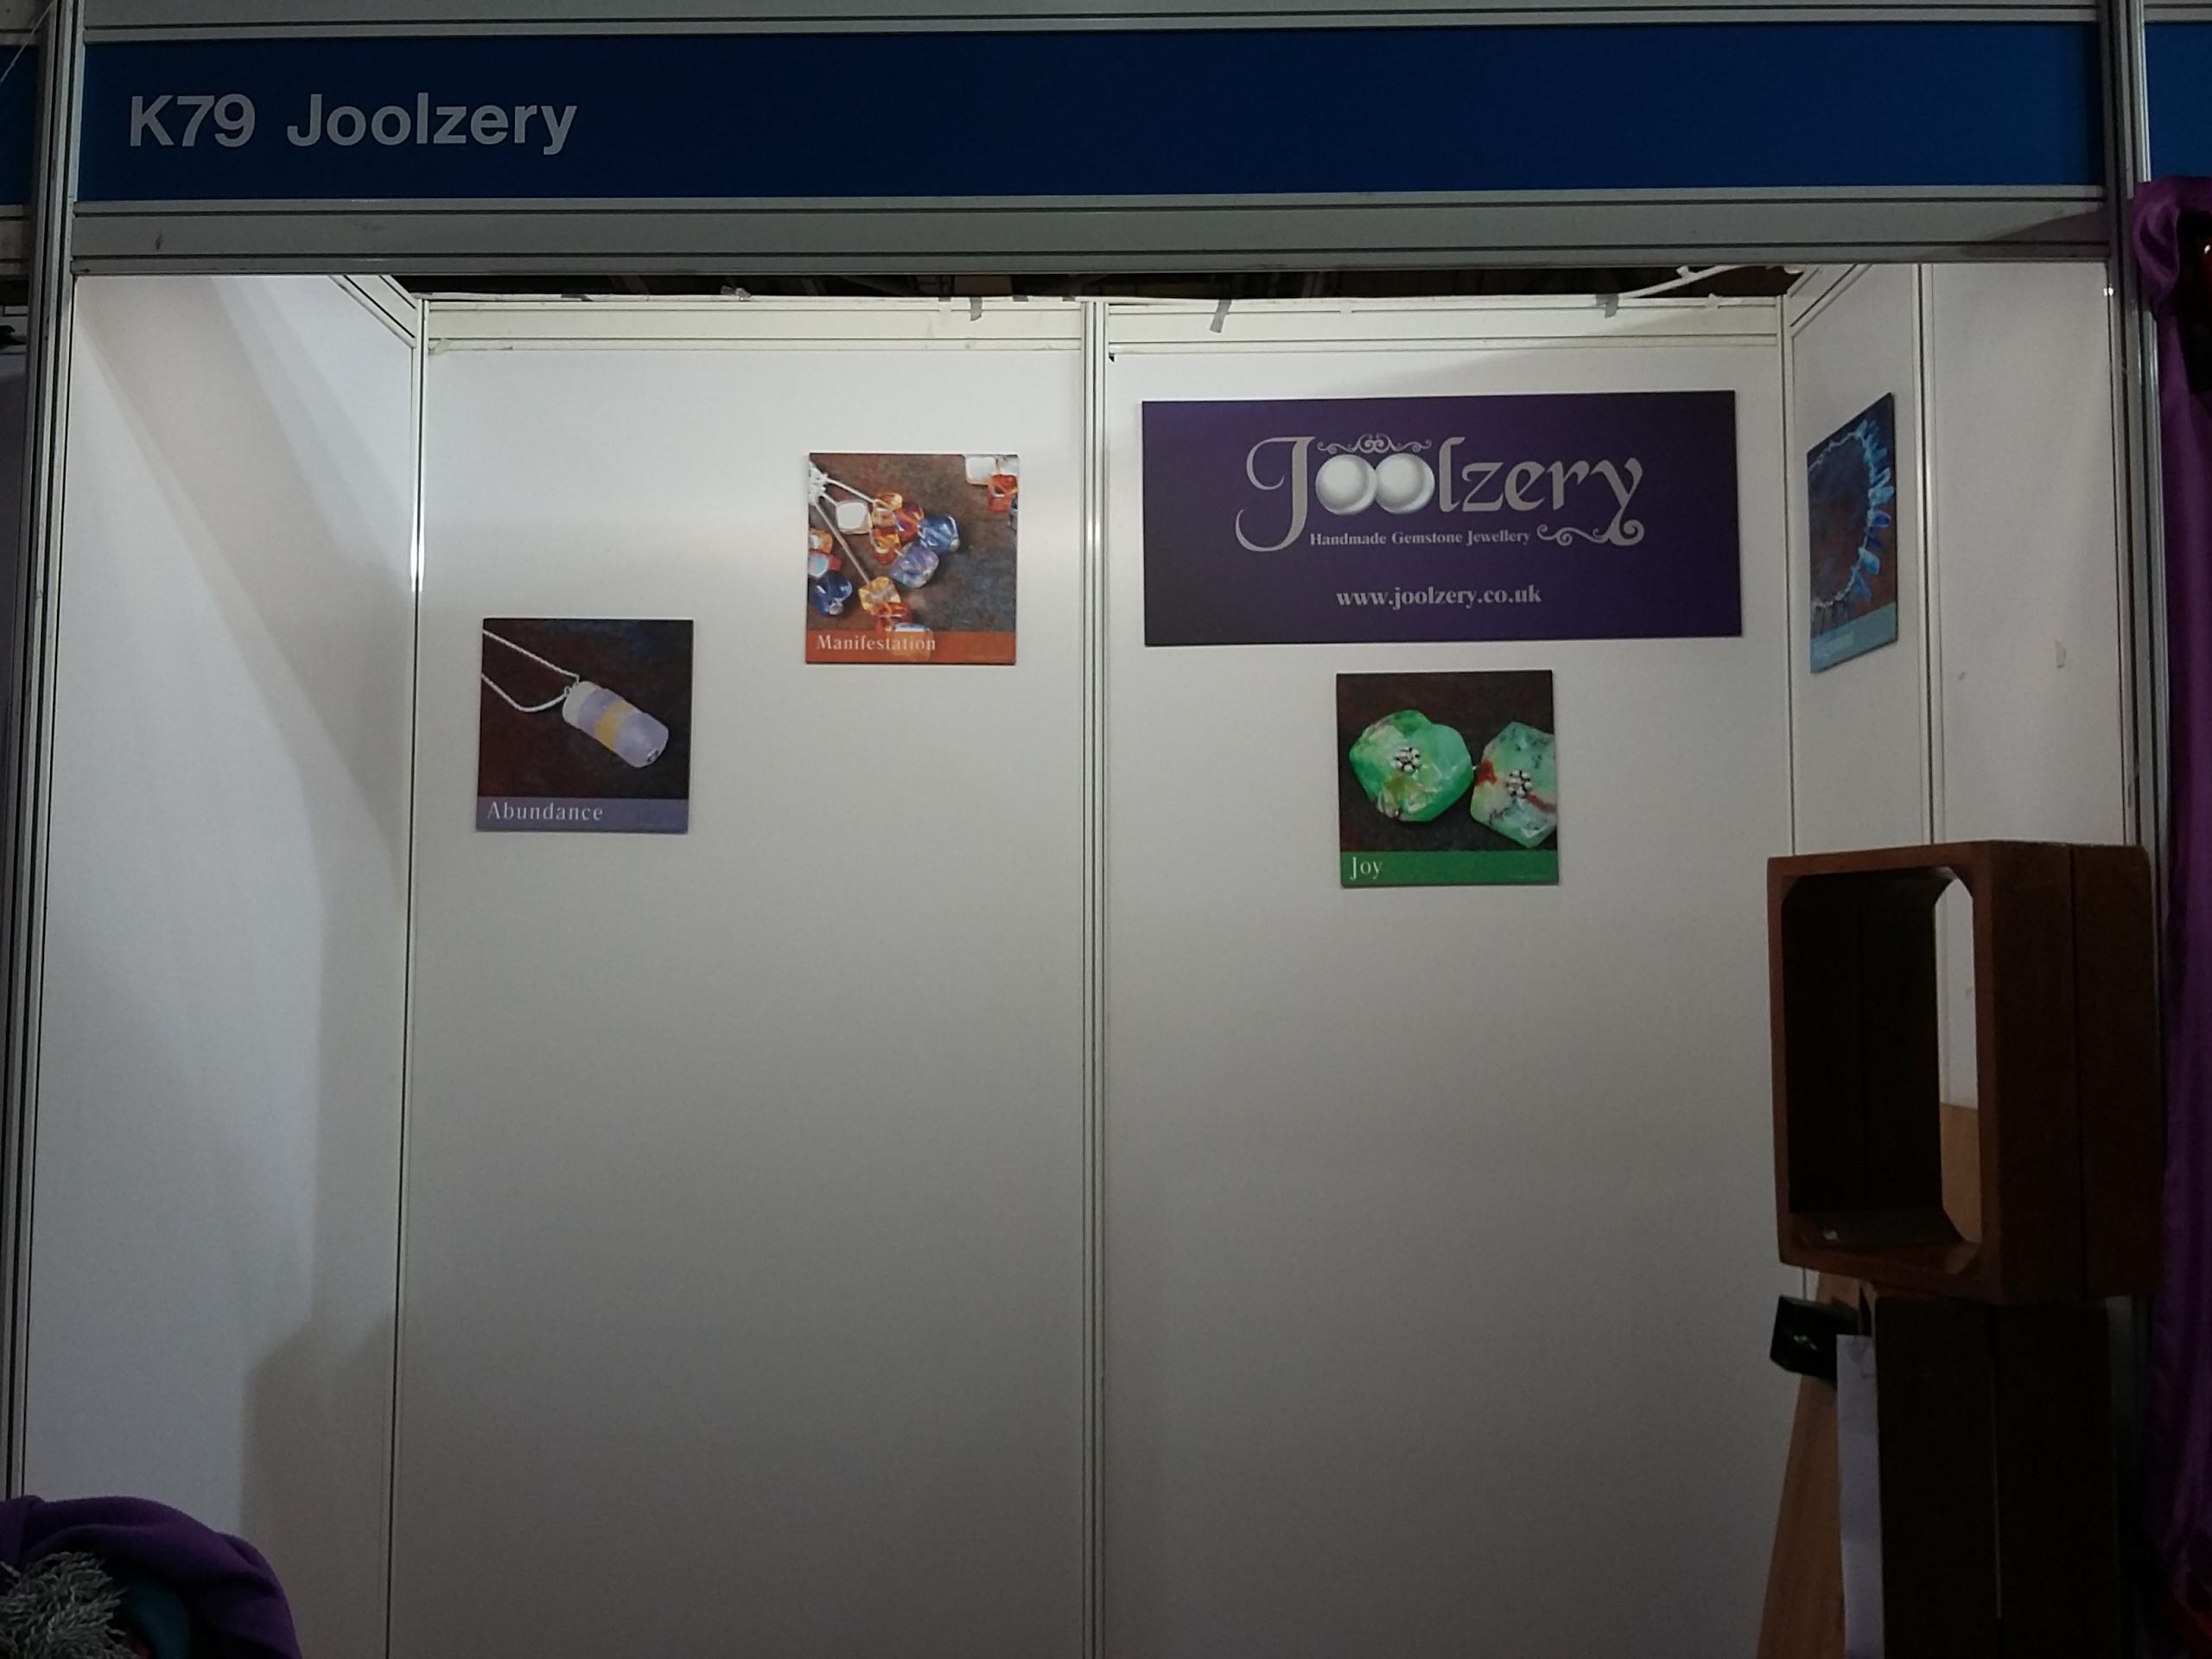 Joolzery K79 Scotland Trade Show In Progress